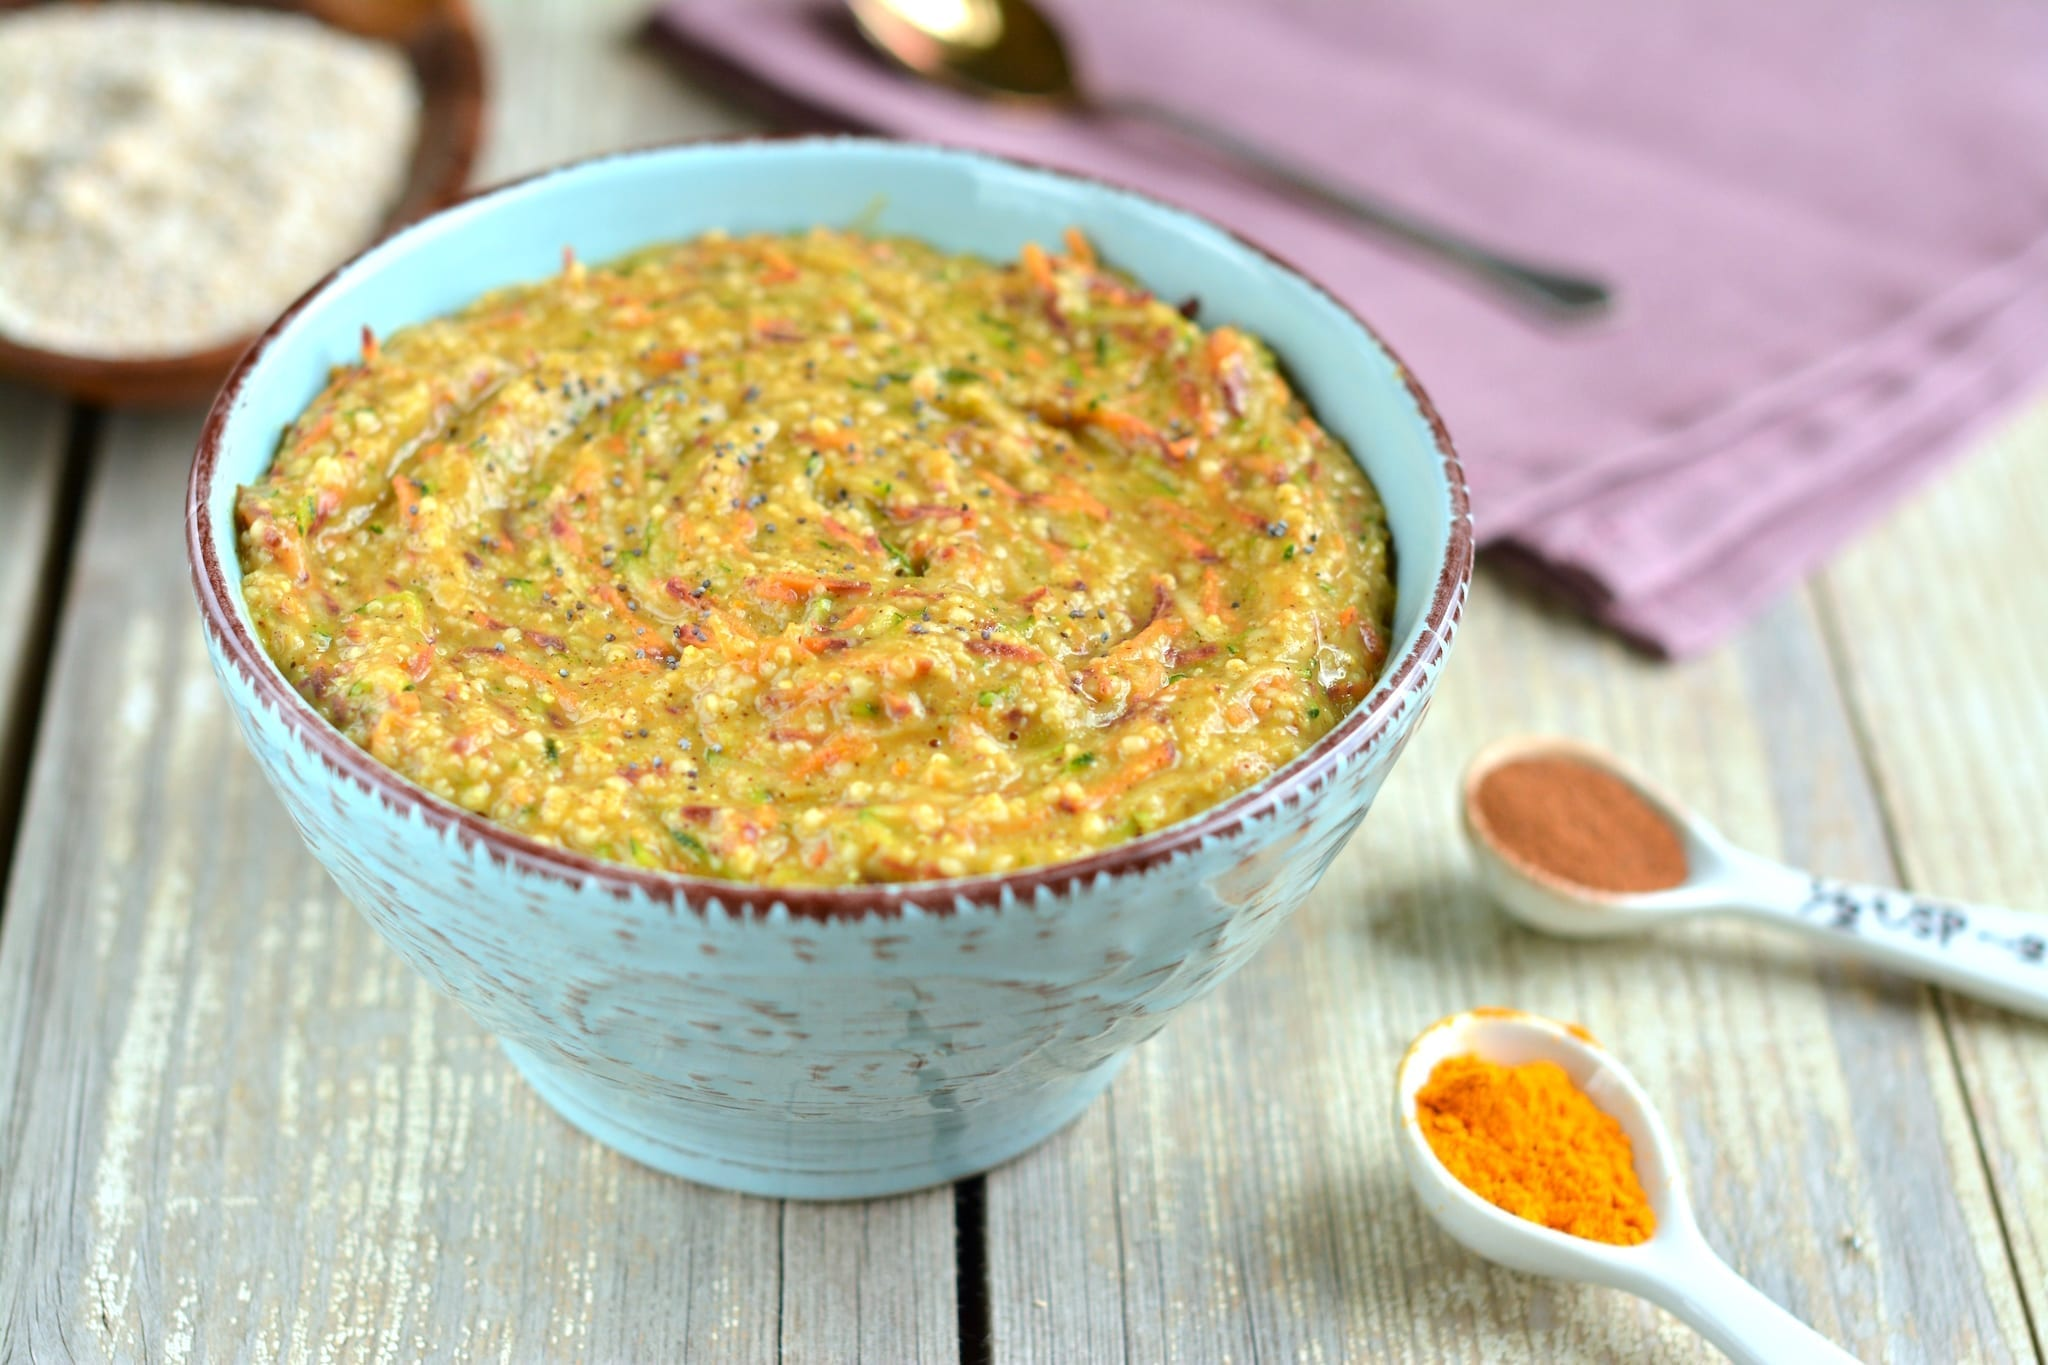 porridge-spiced-oat-bran-carrot-zucchini